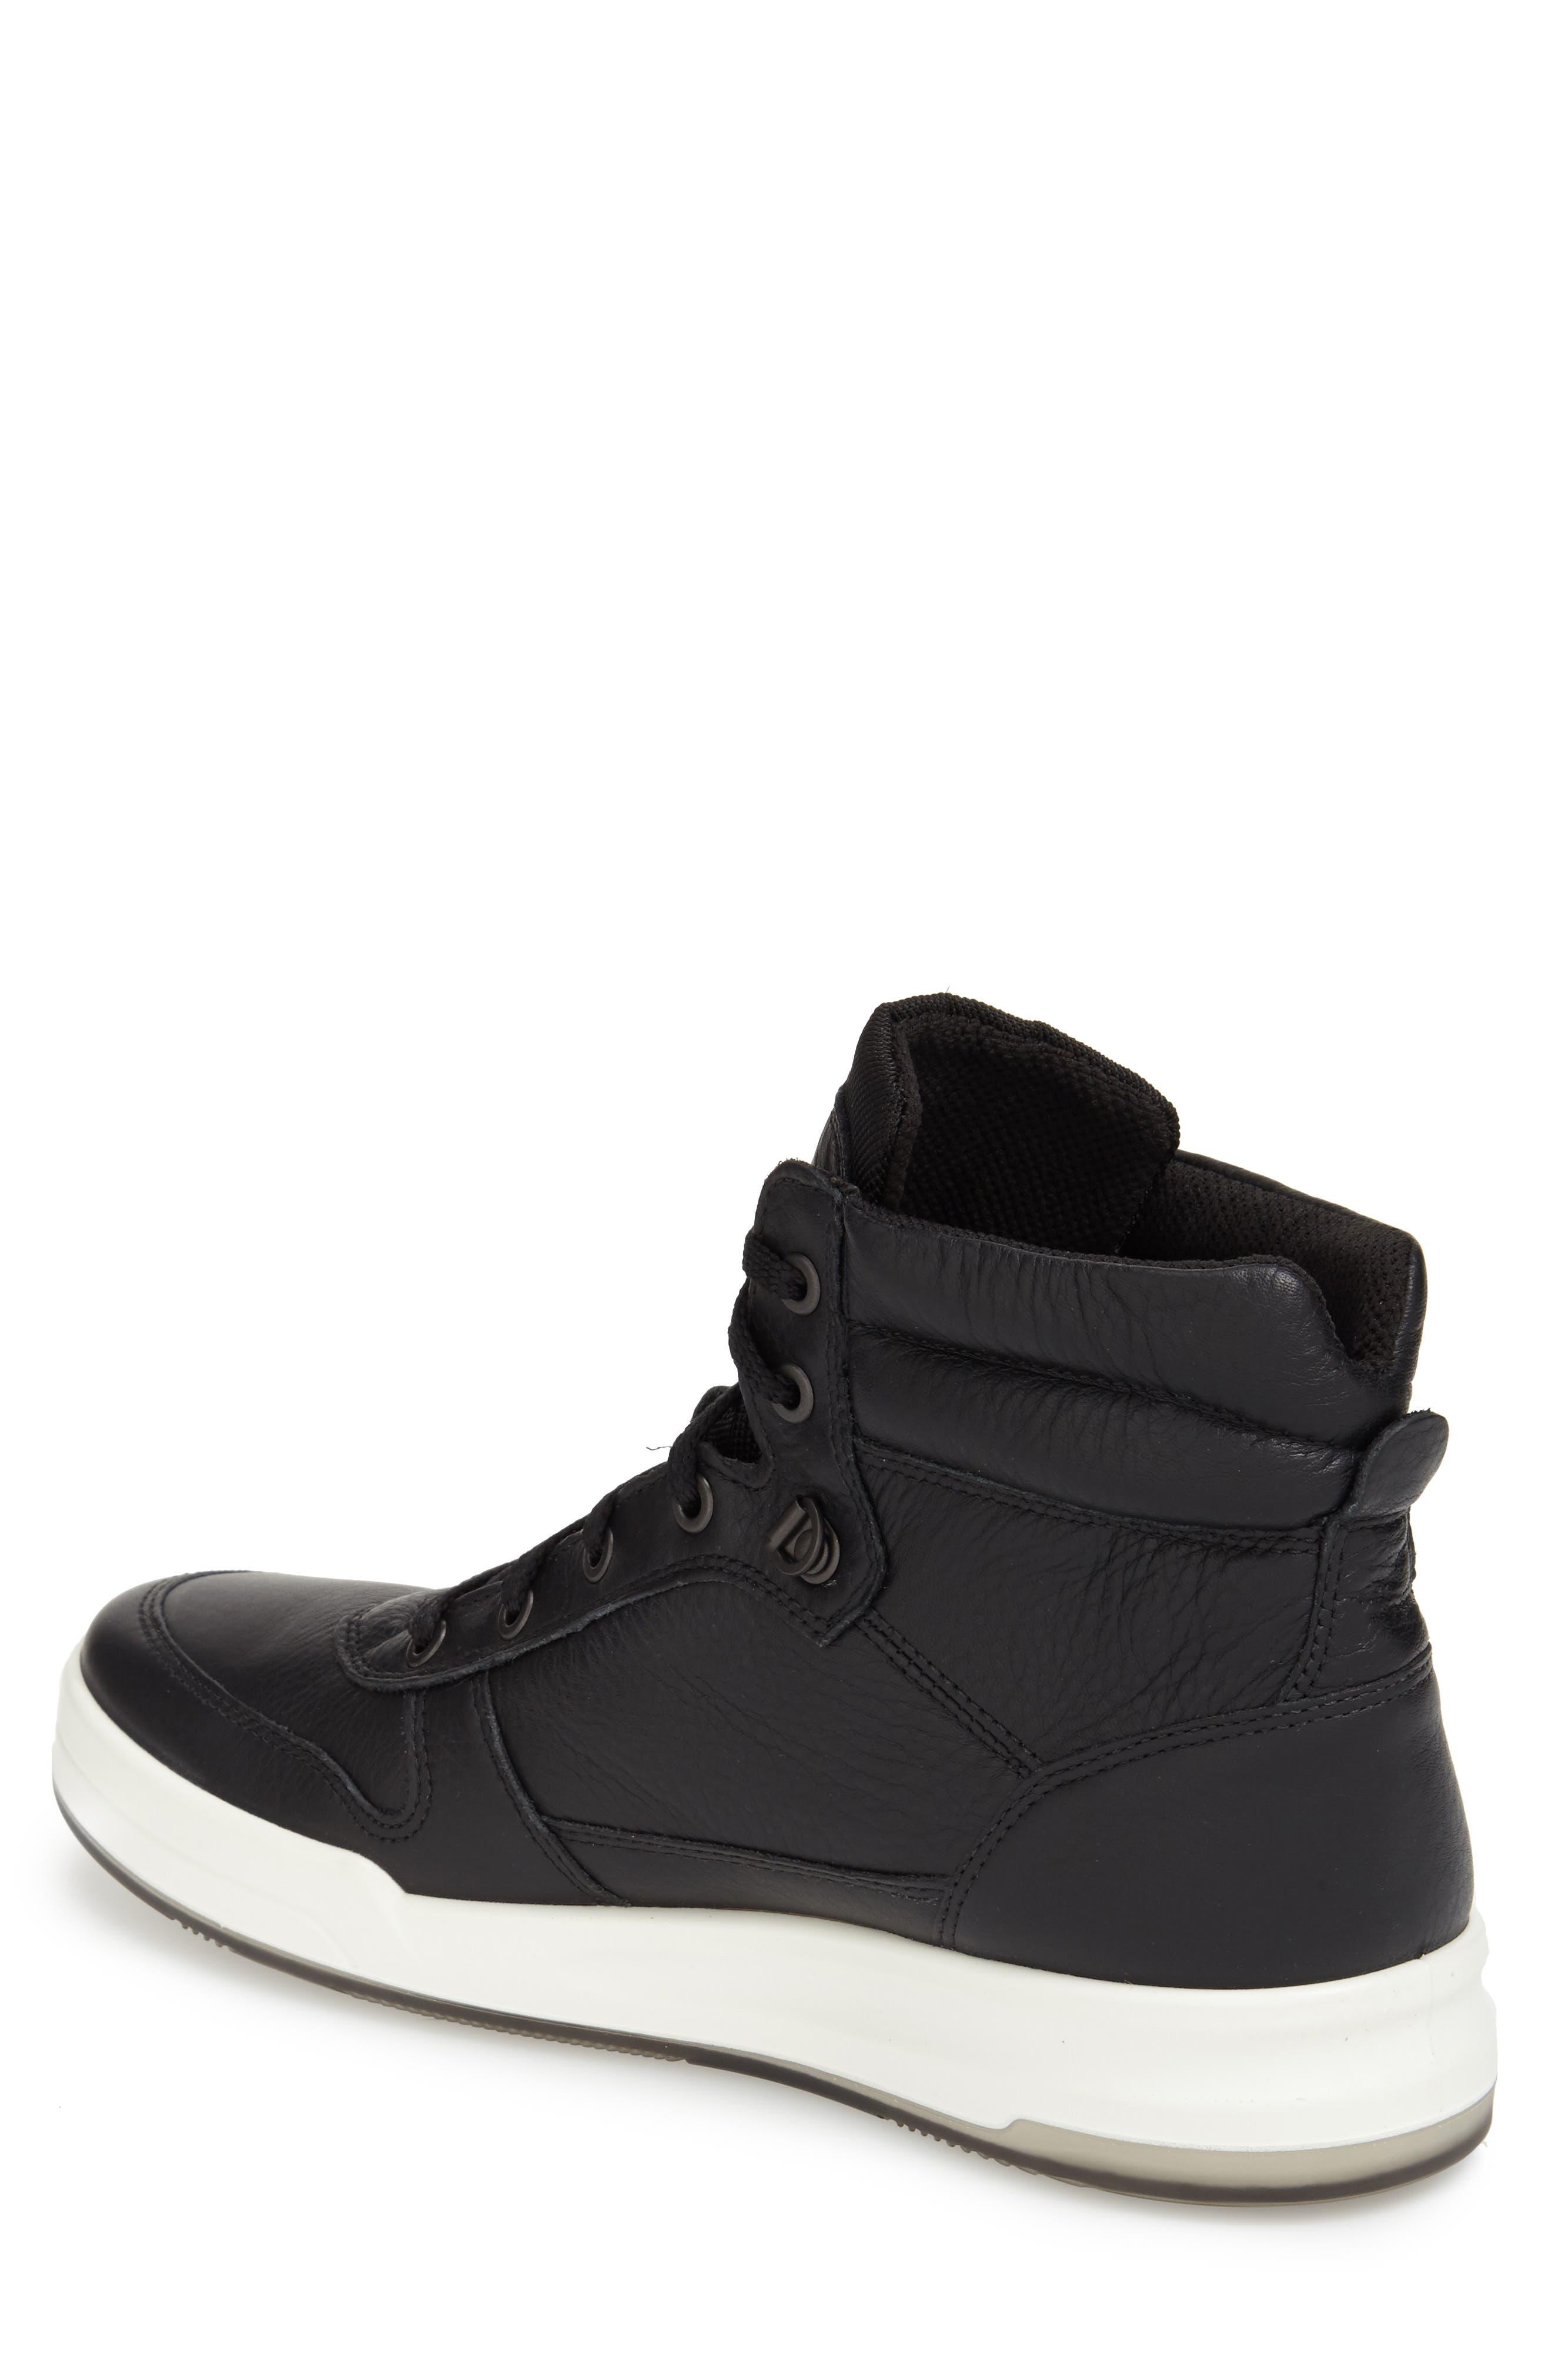 'Jack' High Top Sneaker,                             Alternate thumbnail 3, color,                             001